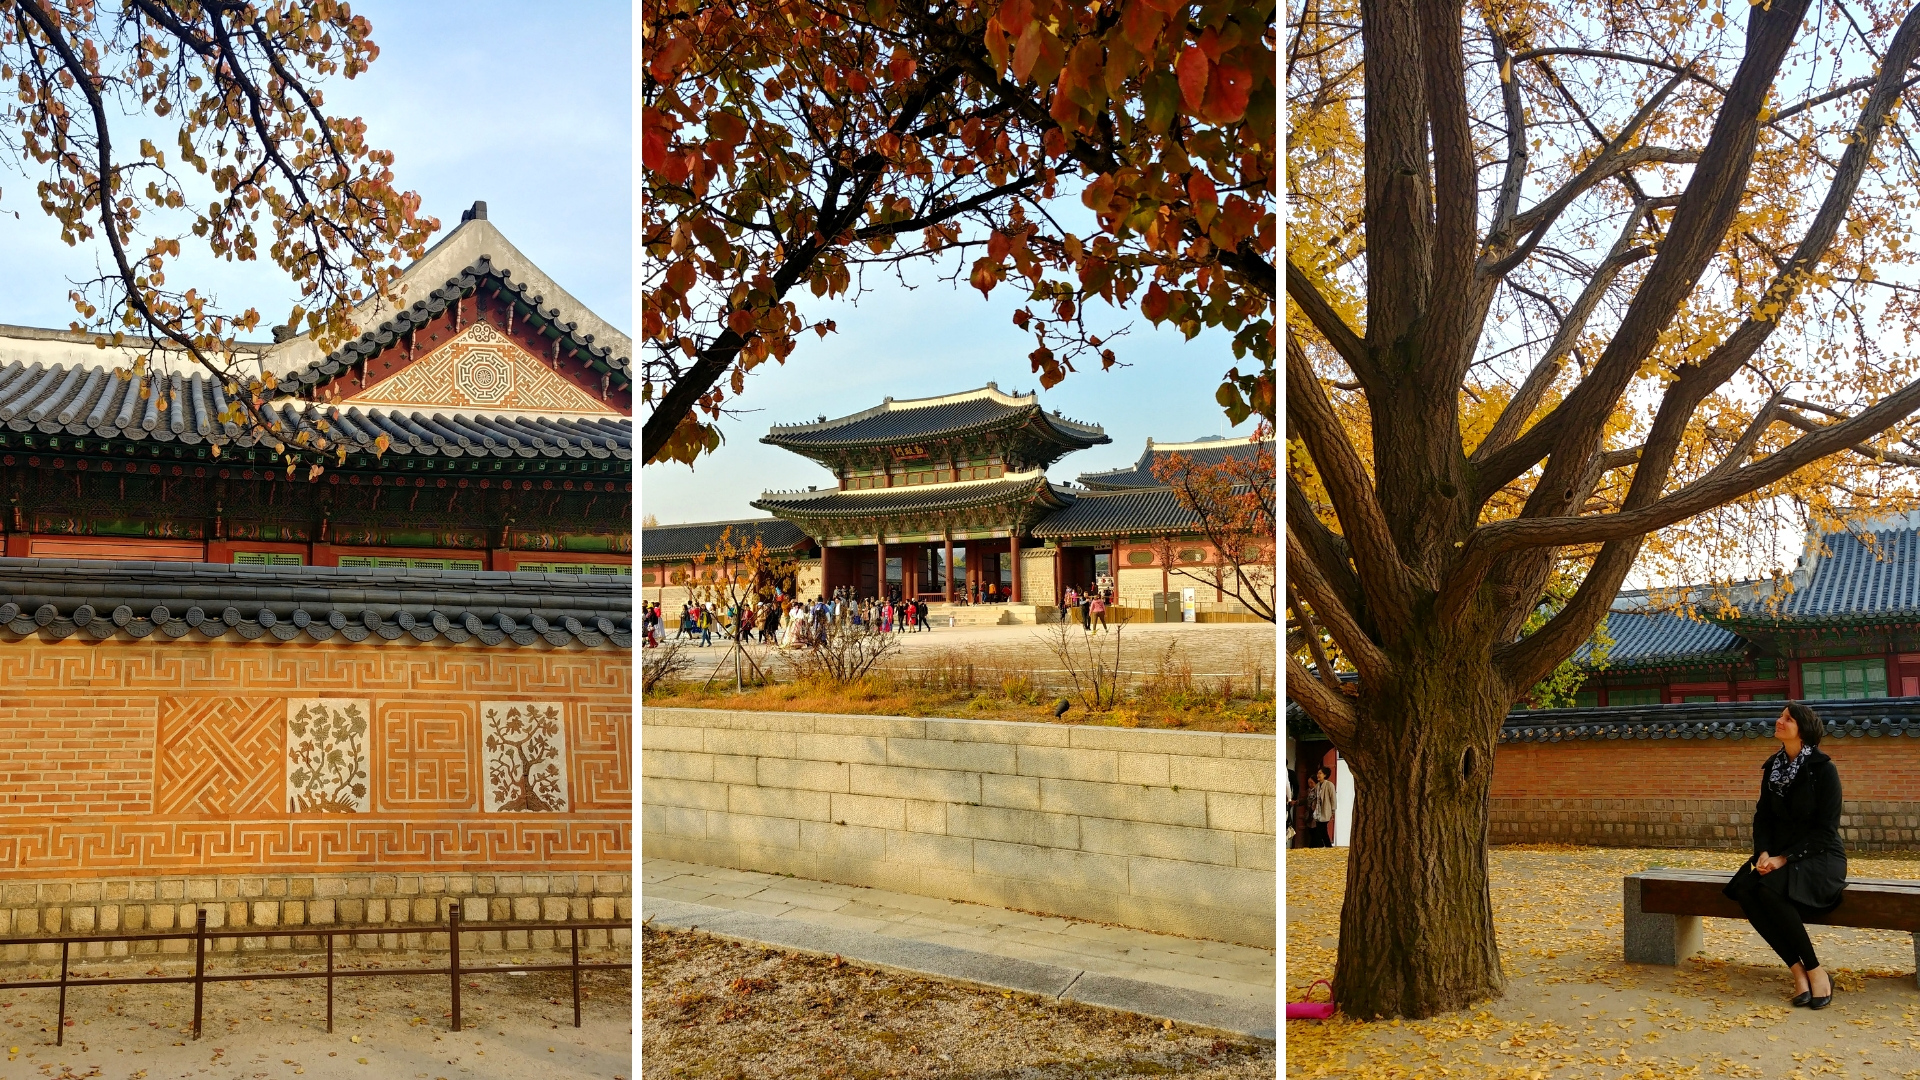 seoul Gyeongbokgung palais coree du sud blog voyage arpenter le chemin